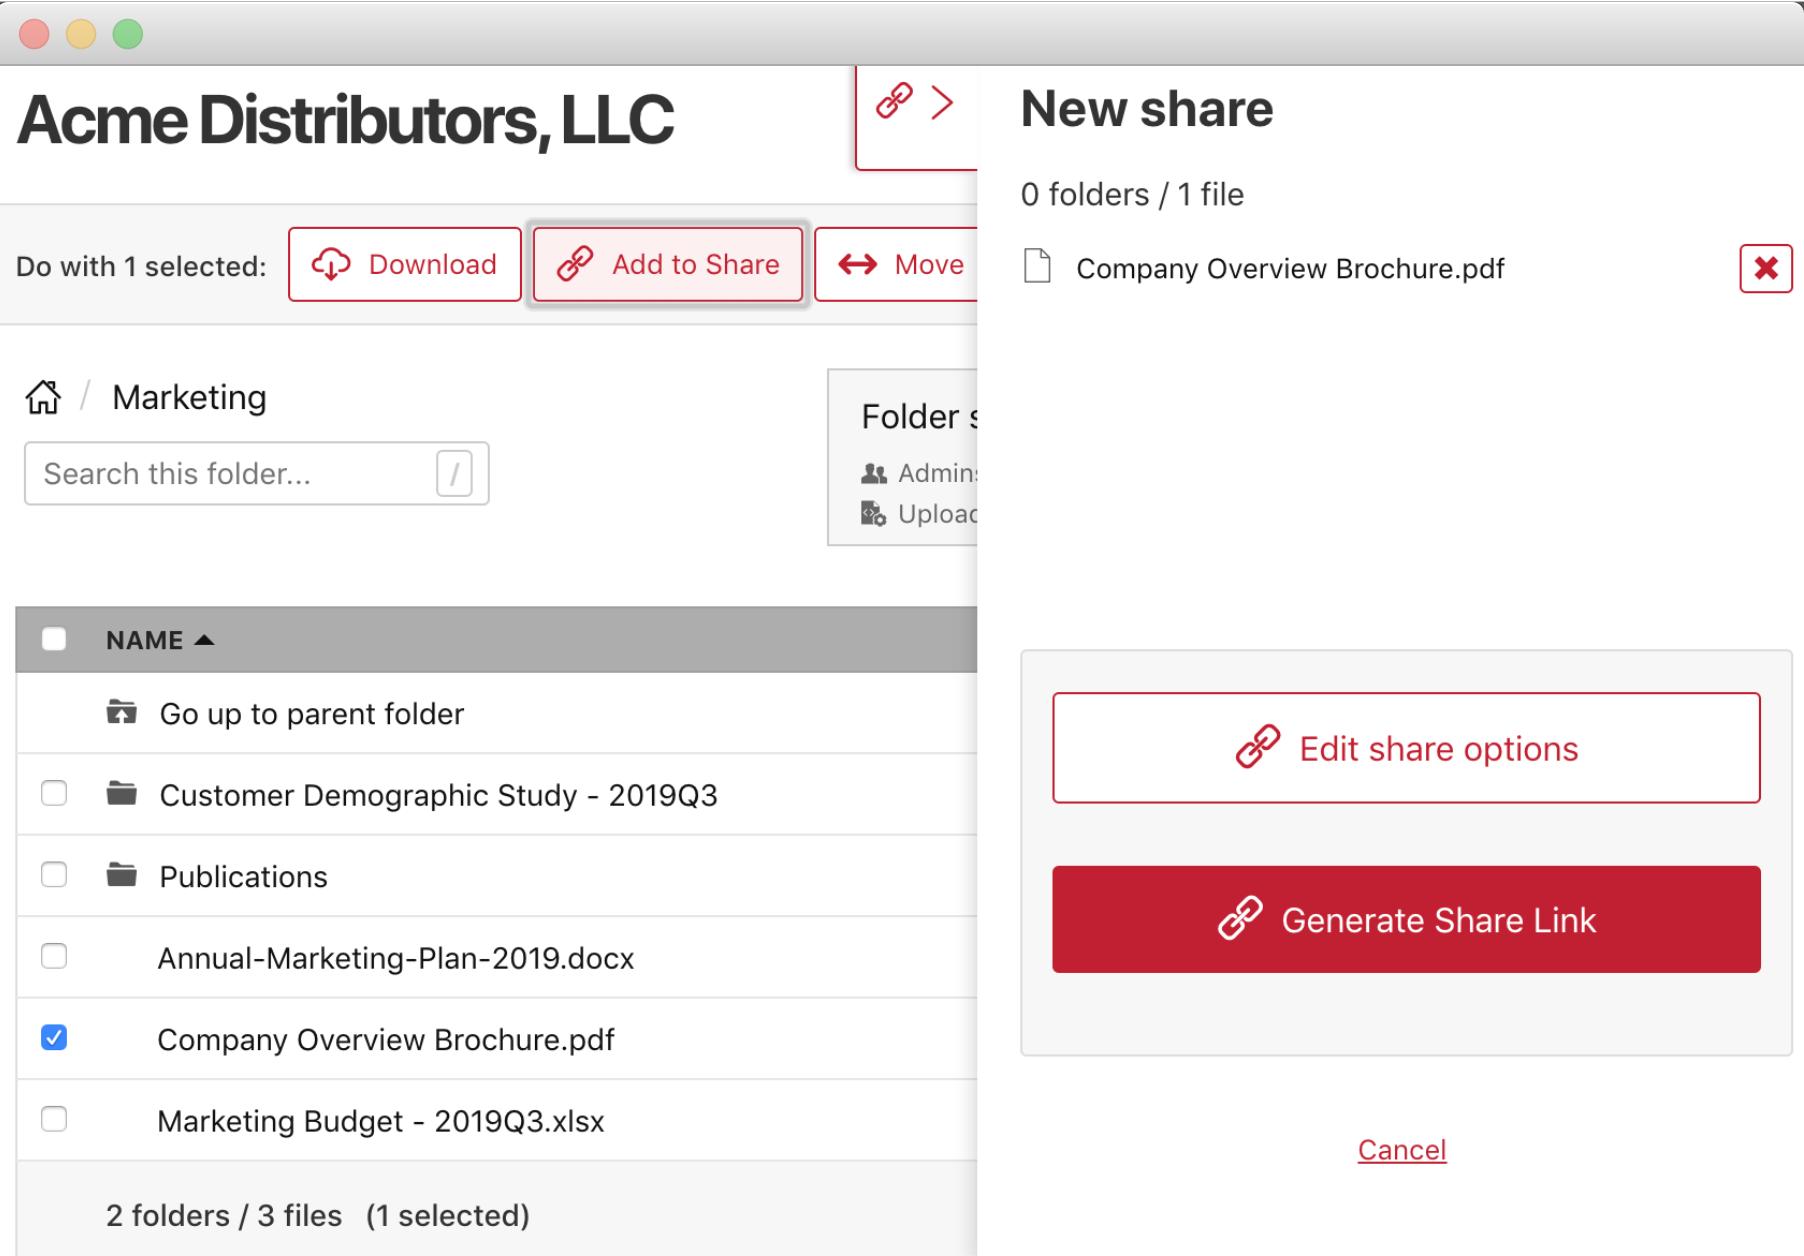 Share Link creation process